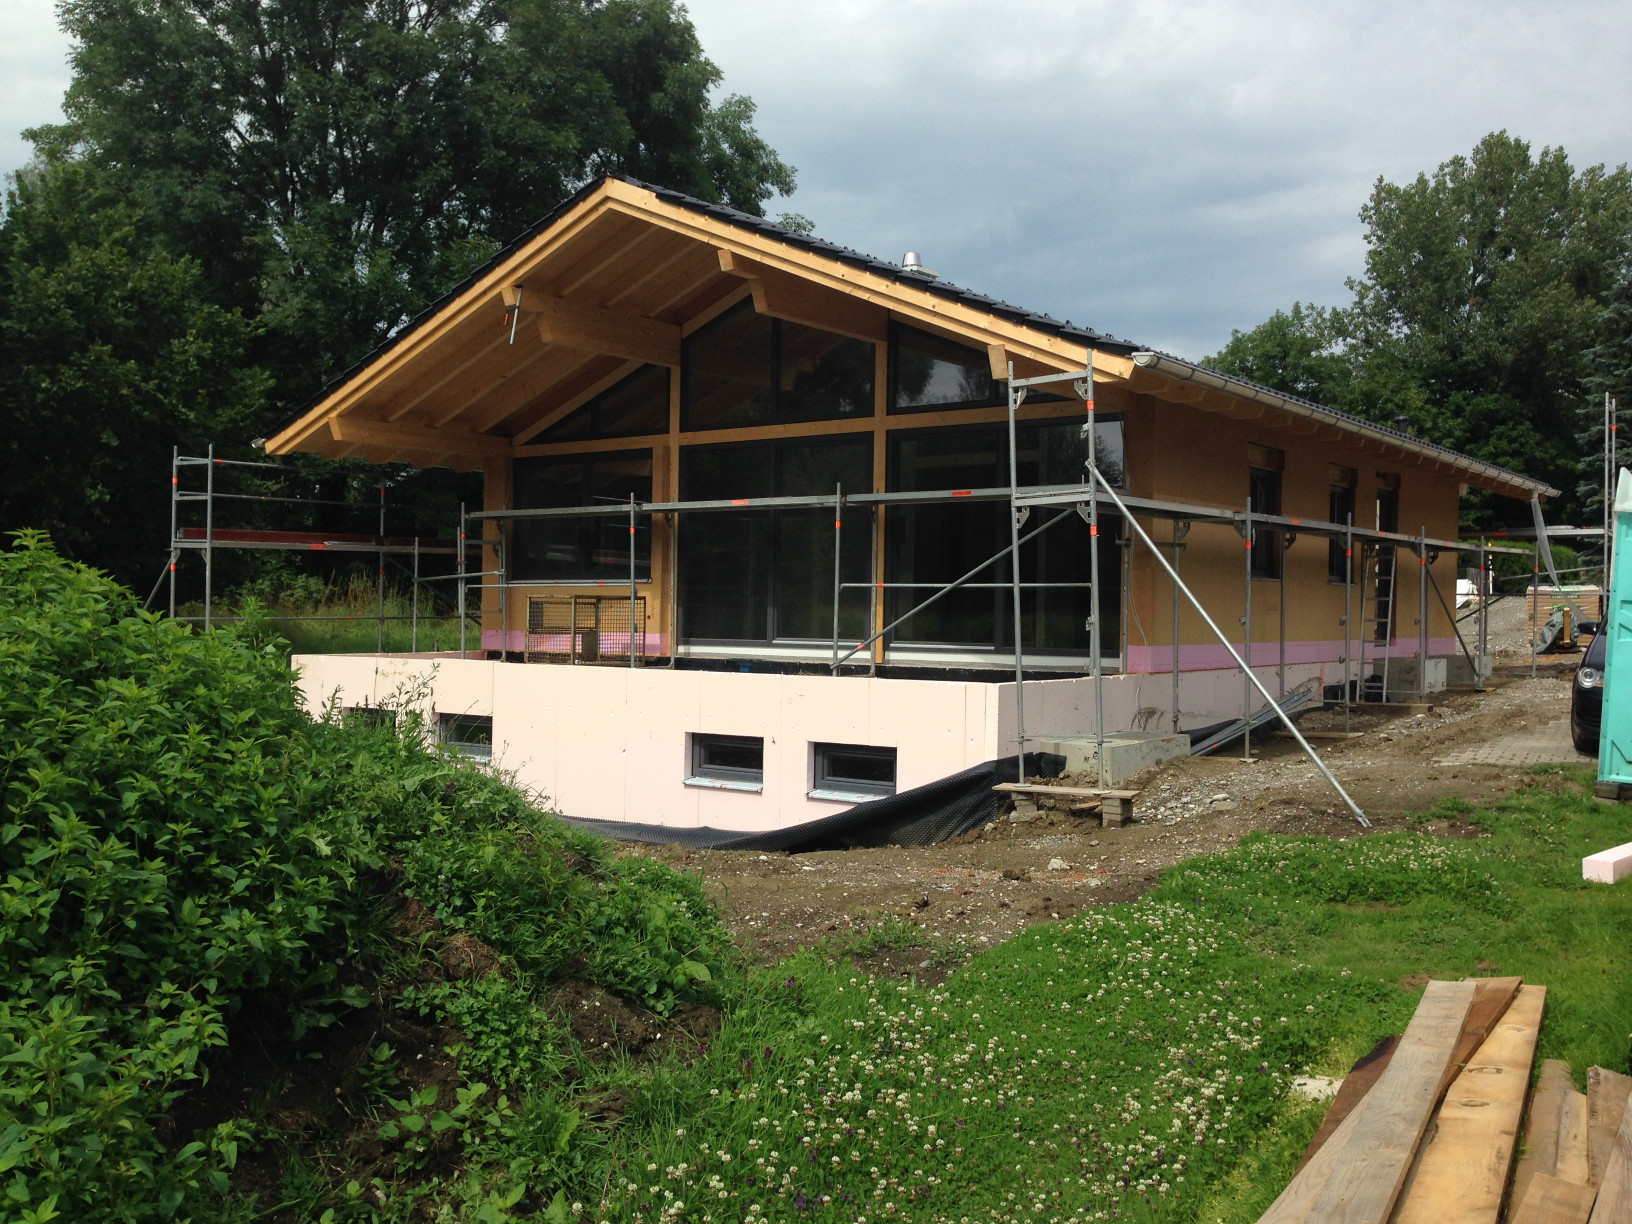 IMG_3035Strasser Holzbau Riedering.jpg